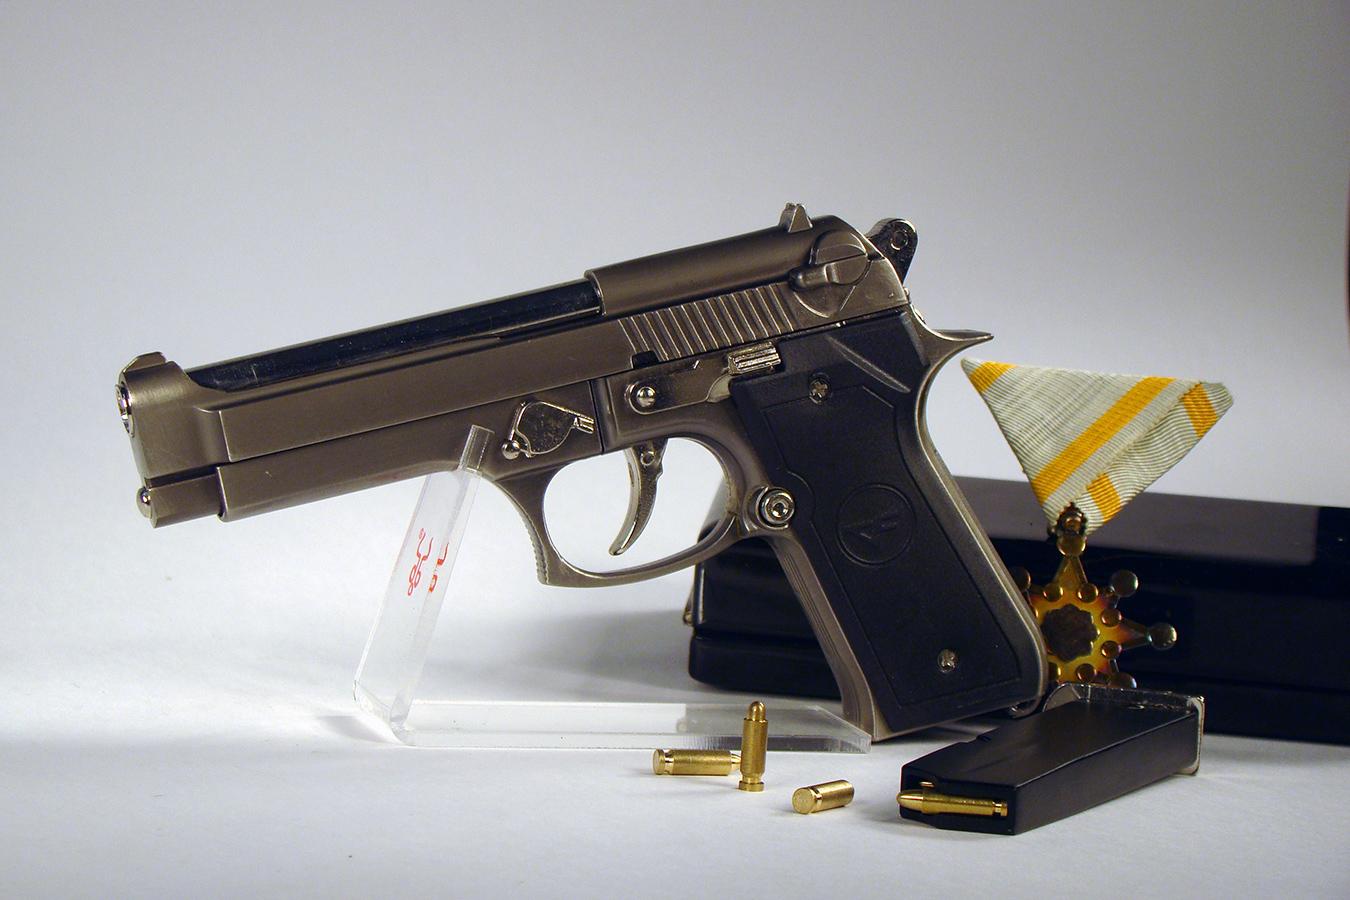 Beretta 92FS 15 см серая изображение 3